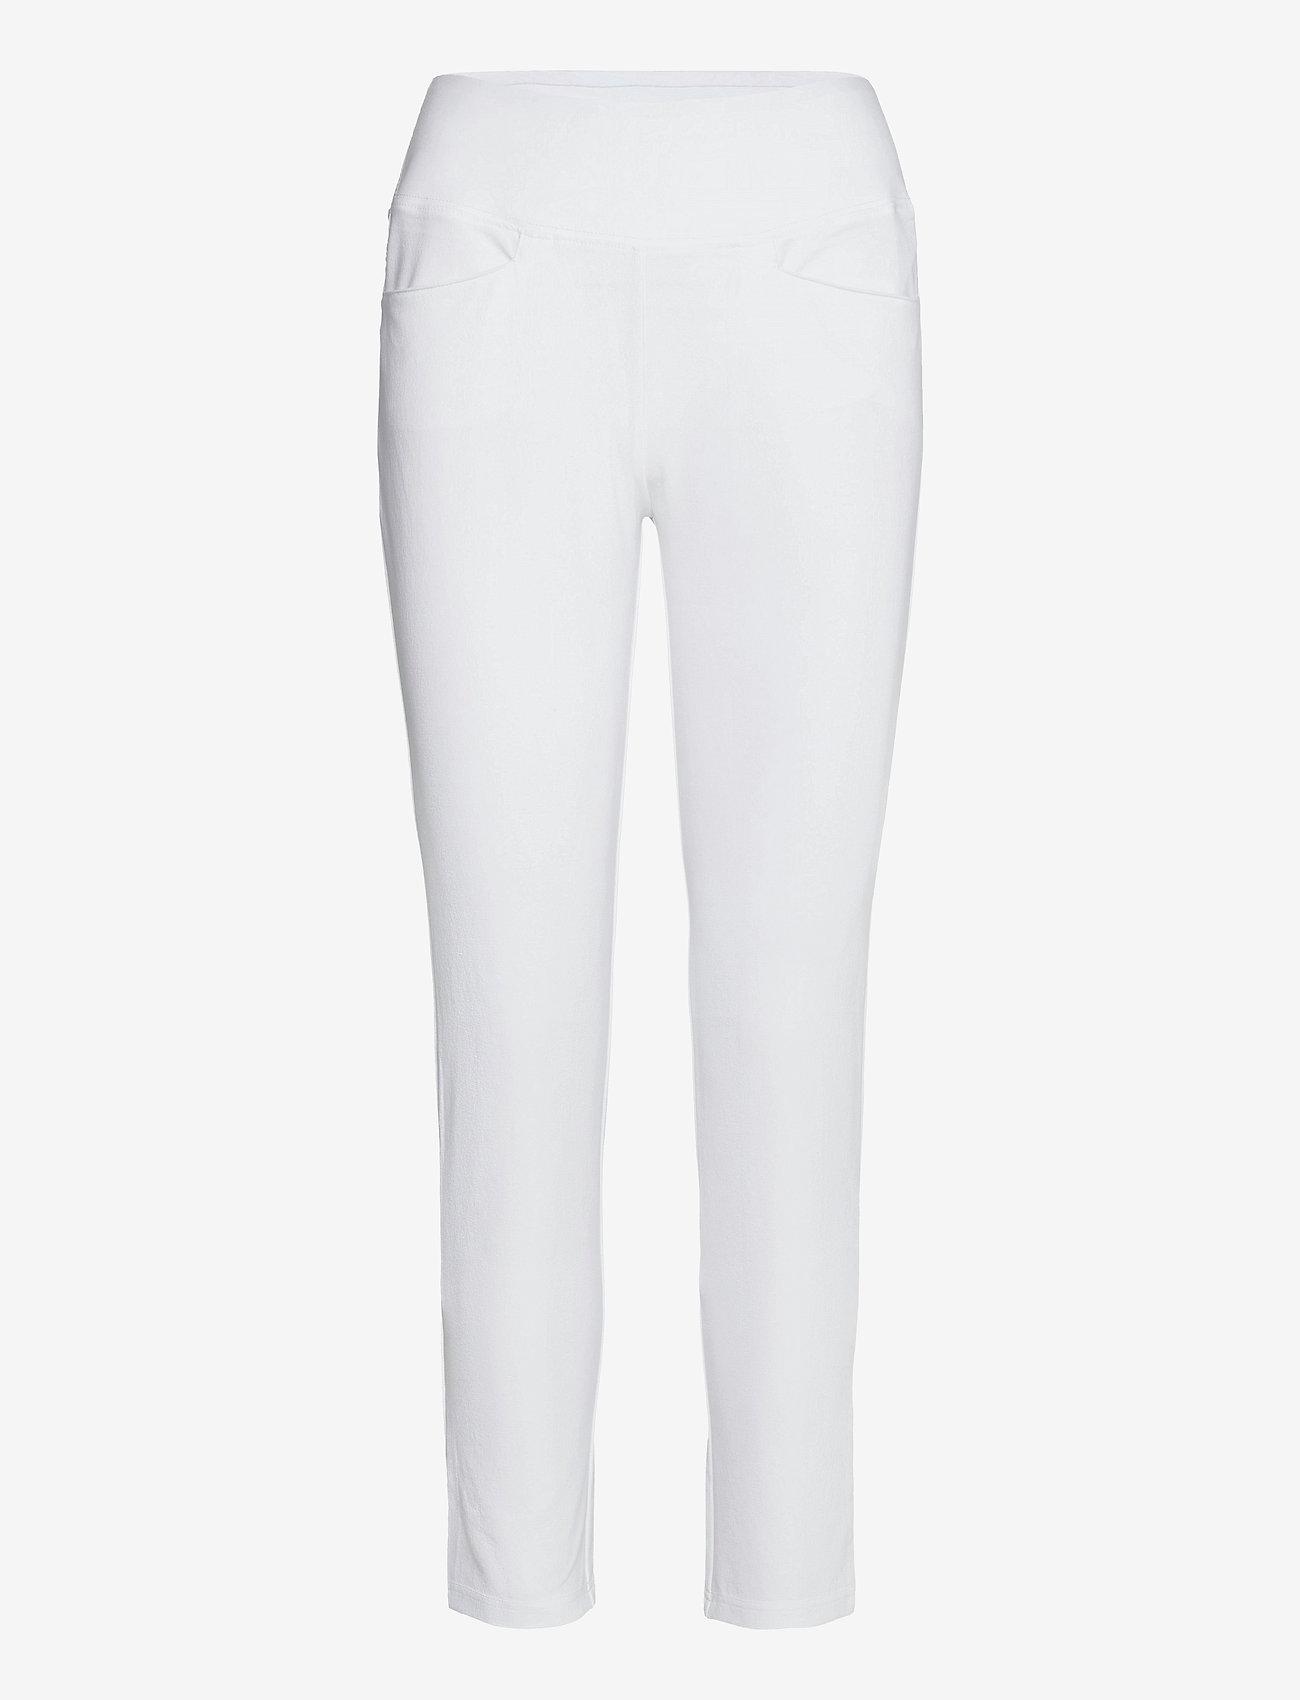 PUMA Golf - PWRSHAPE Pant - golfbroeken - bright white - 0